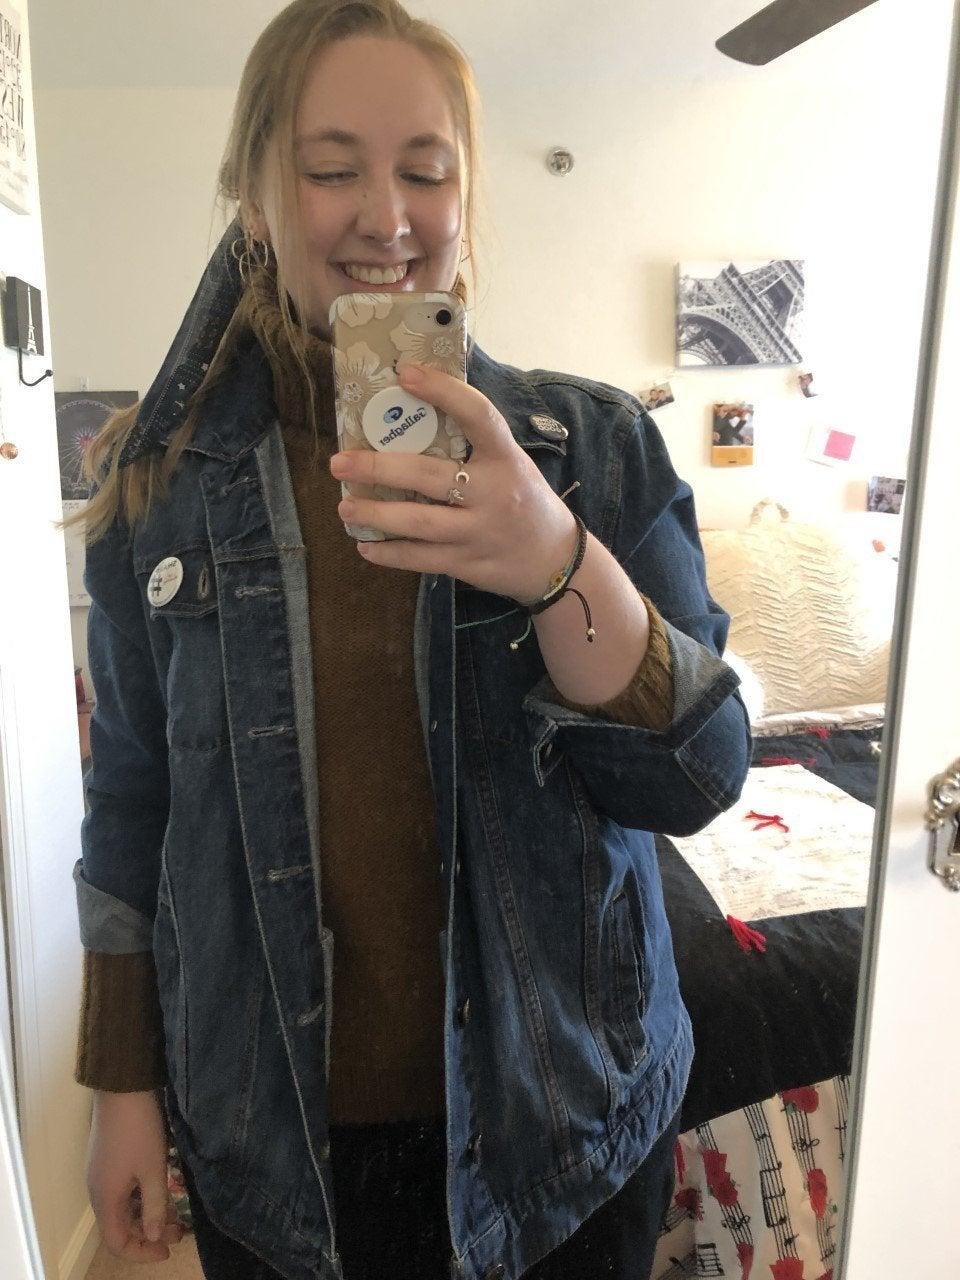 Mirror selfie 2